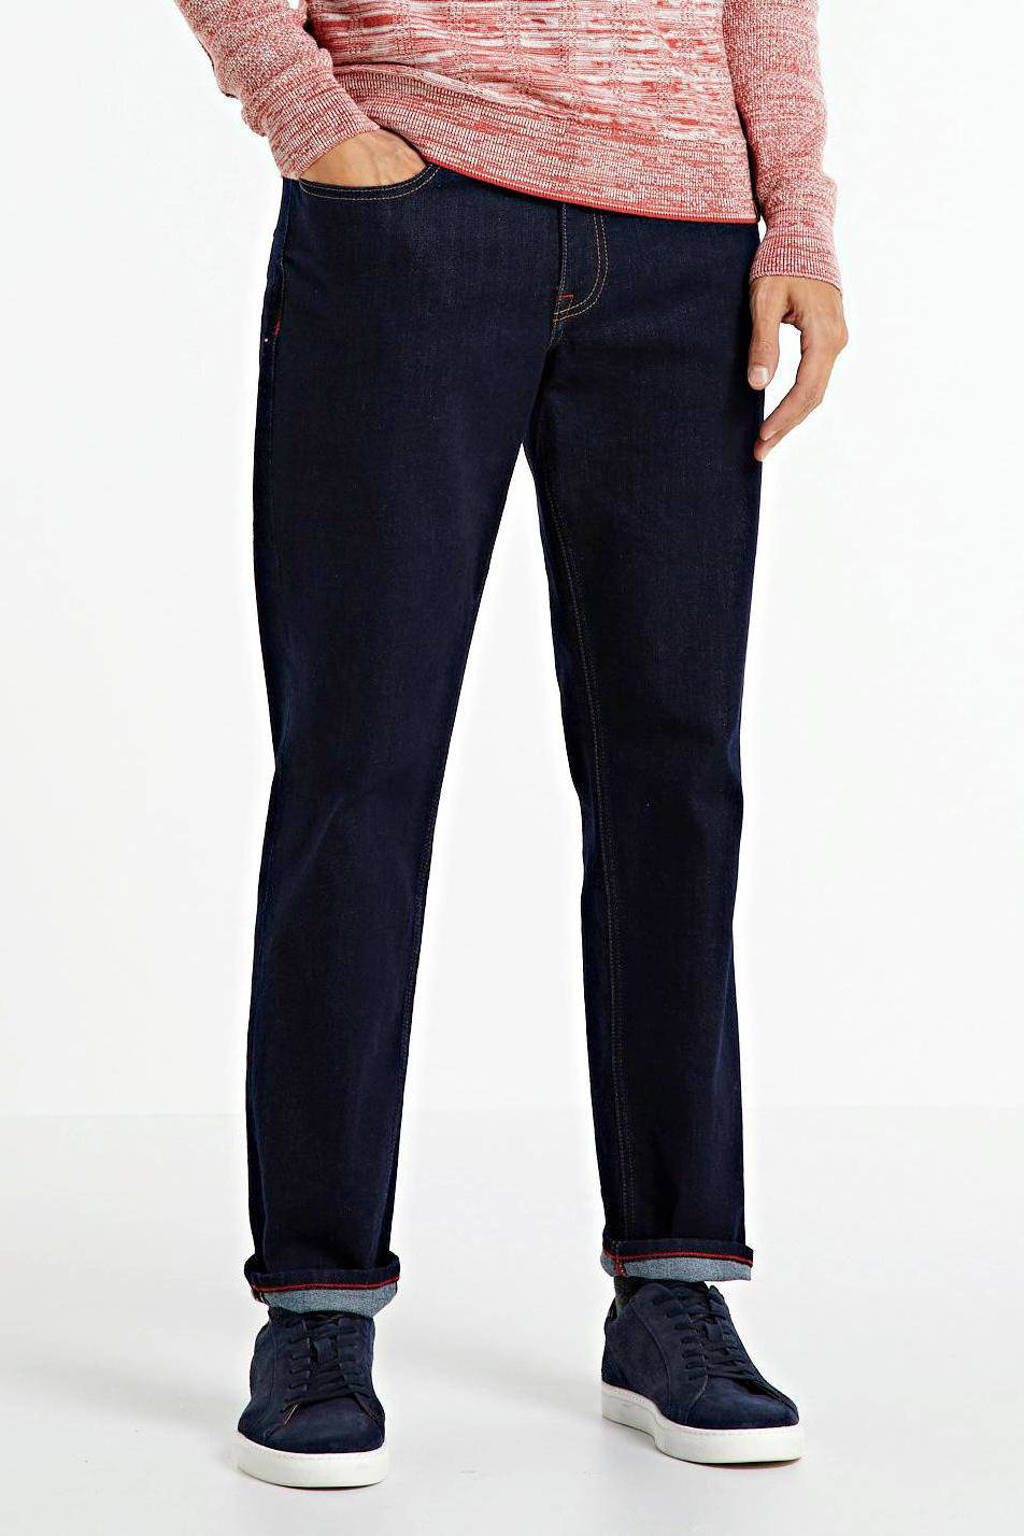 LERROS regular fit jeans Arun dark water, 494 - dark water